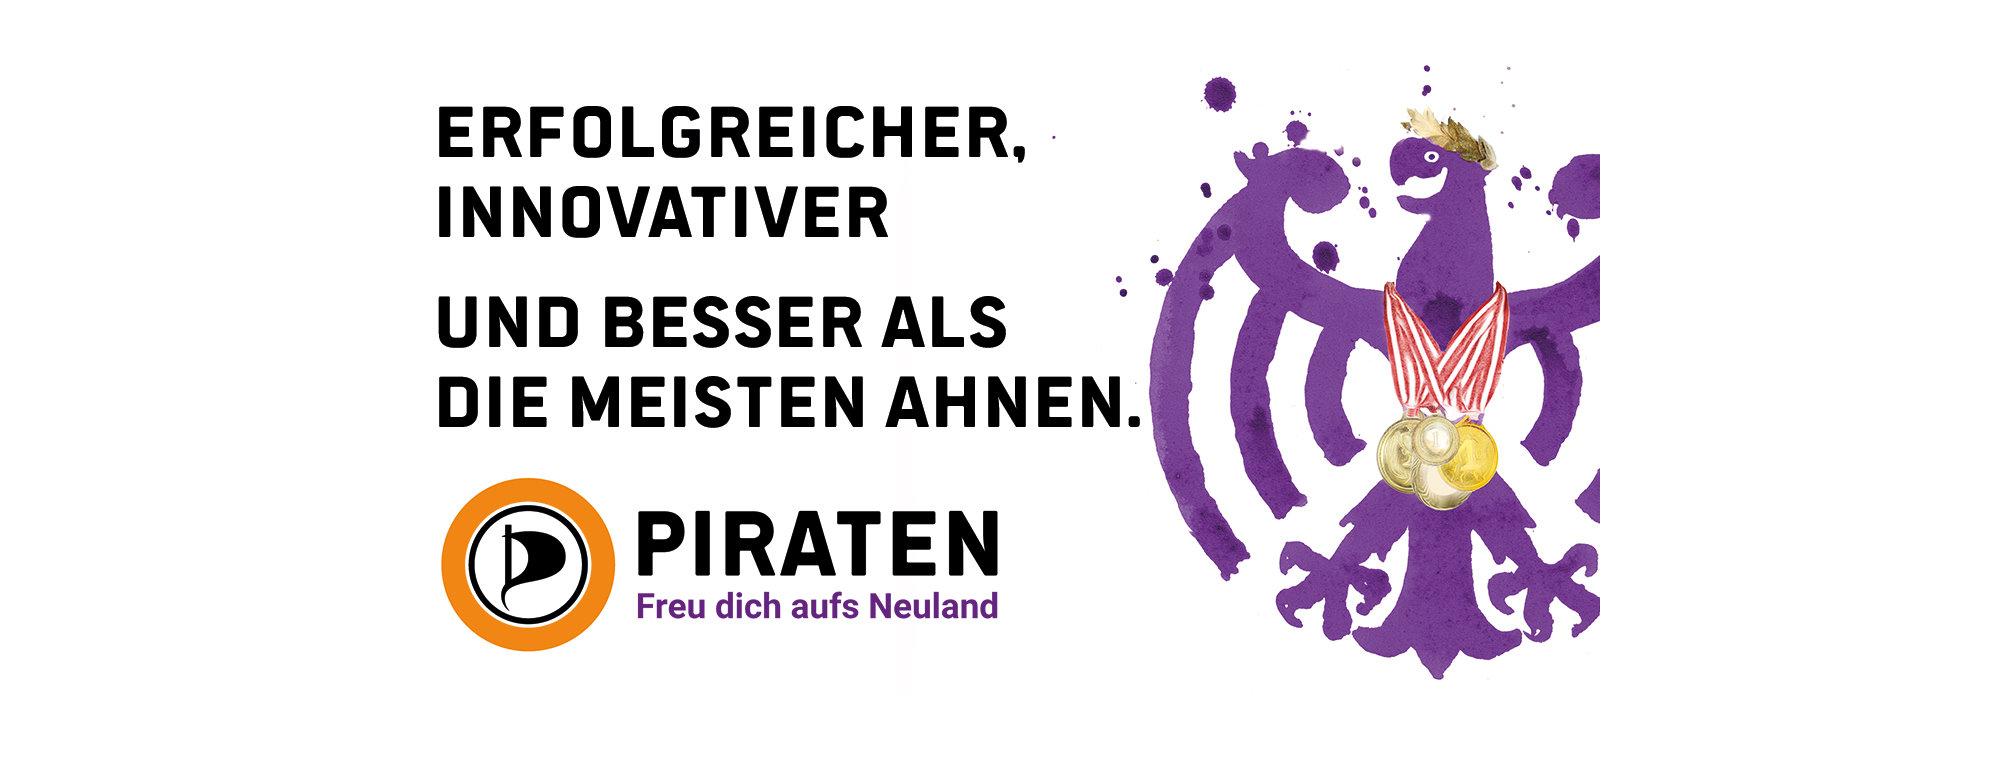 #FreuDichaufsNeuland